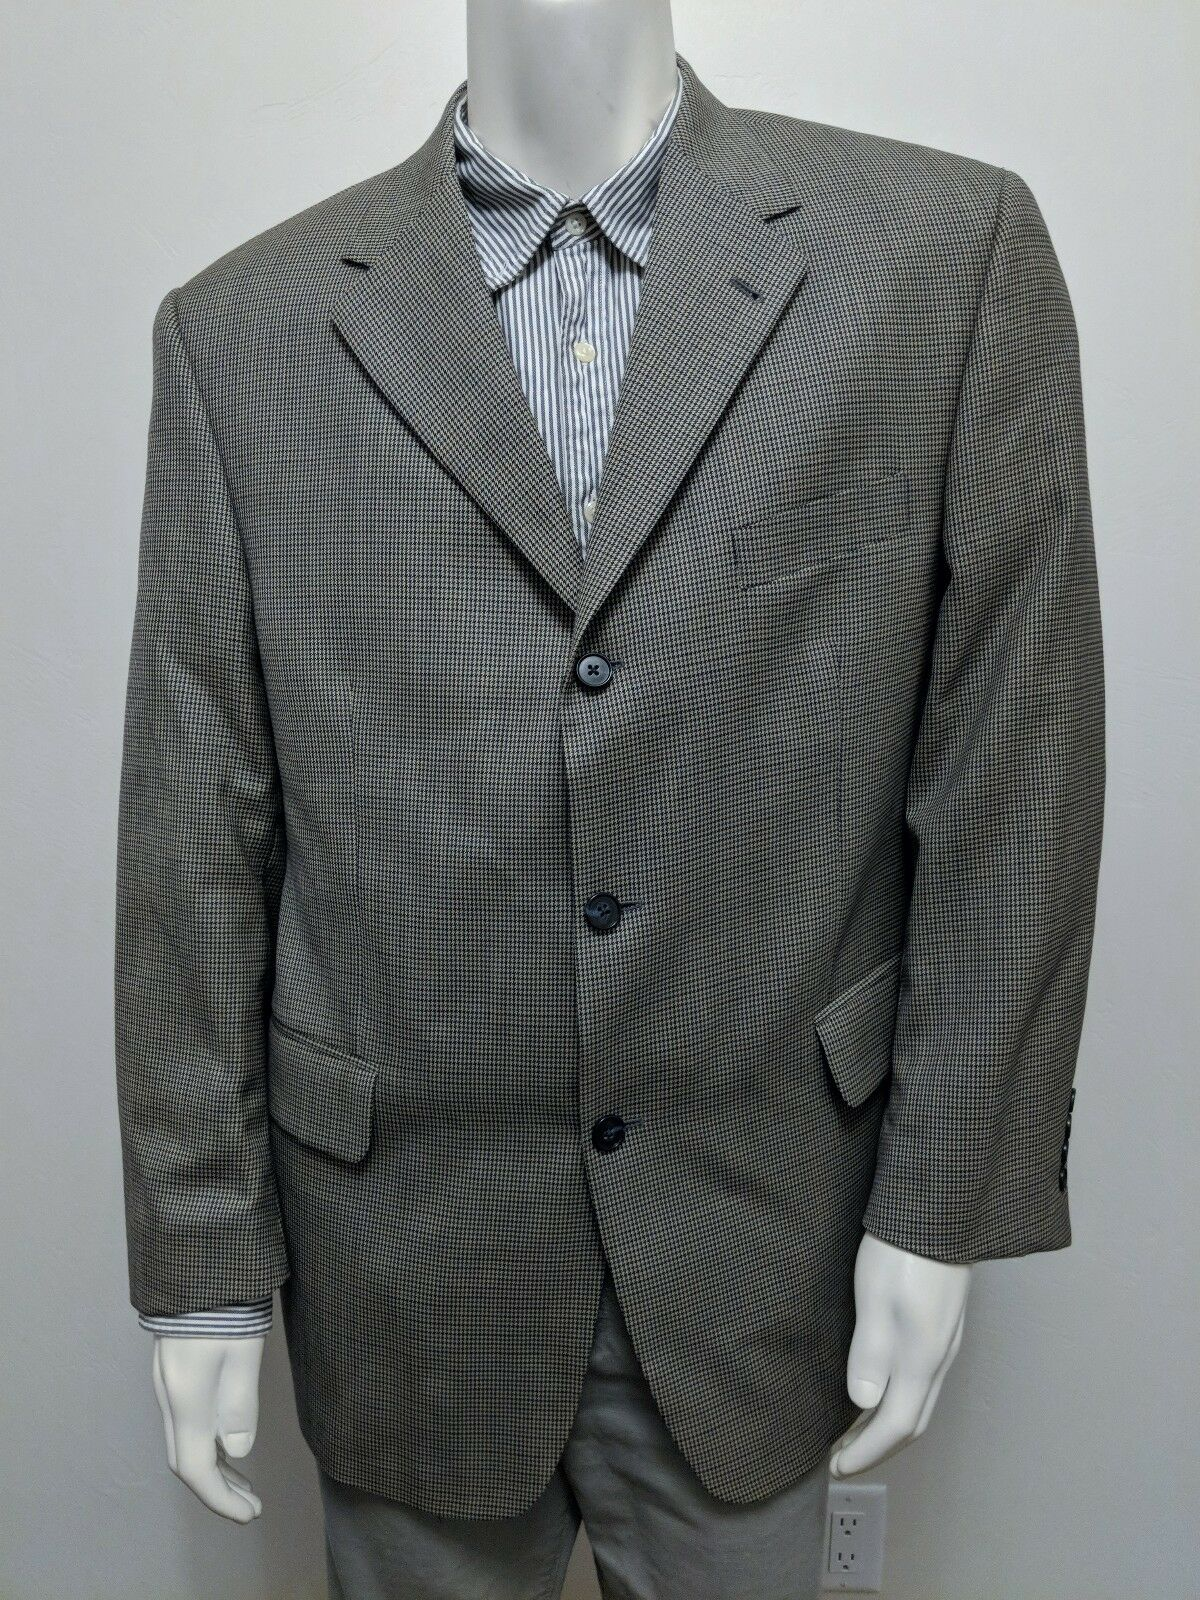 VTG 42S Tommy Hilfiger 100% Wool Blazer/Sportcoat Houndstooth Canada 3-Button